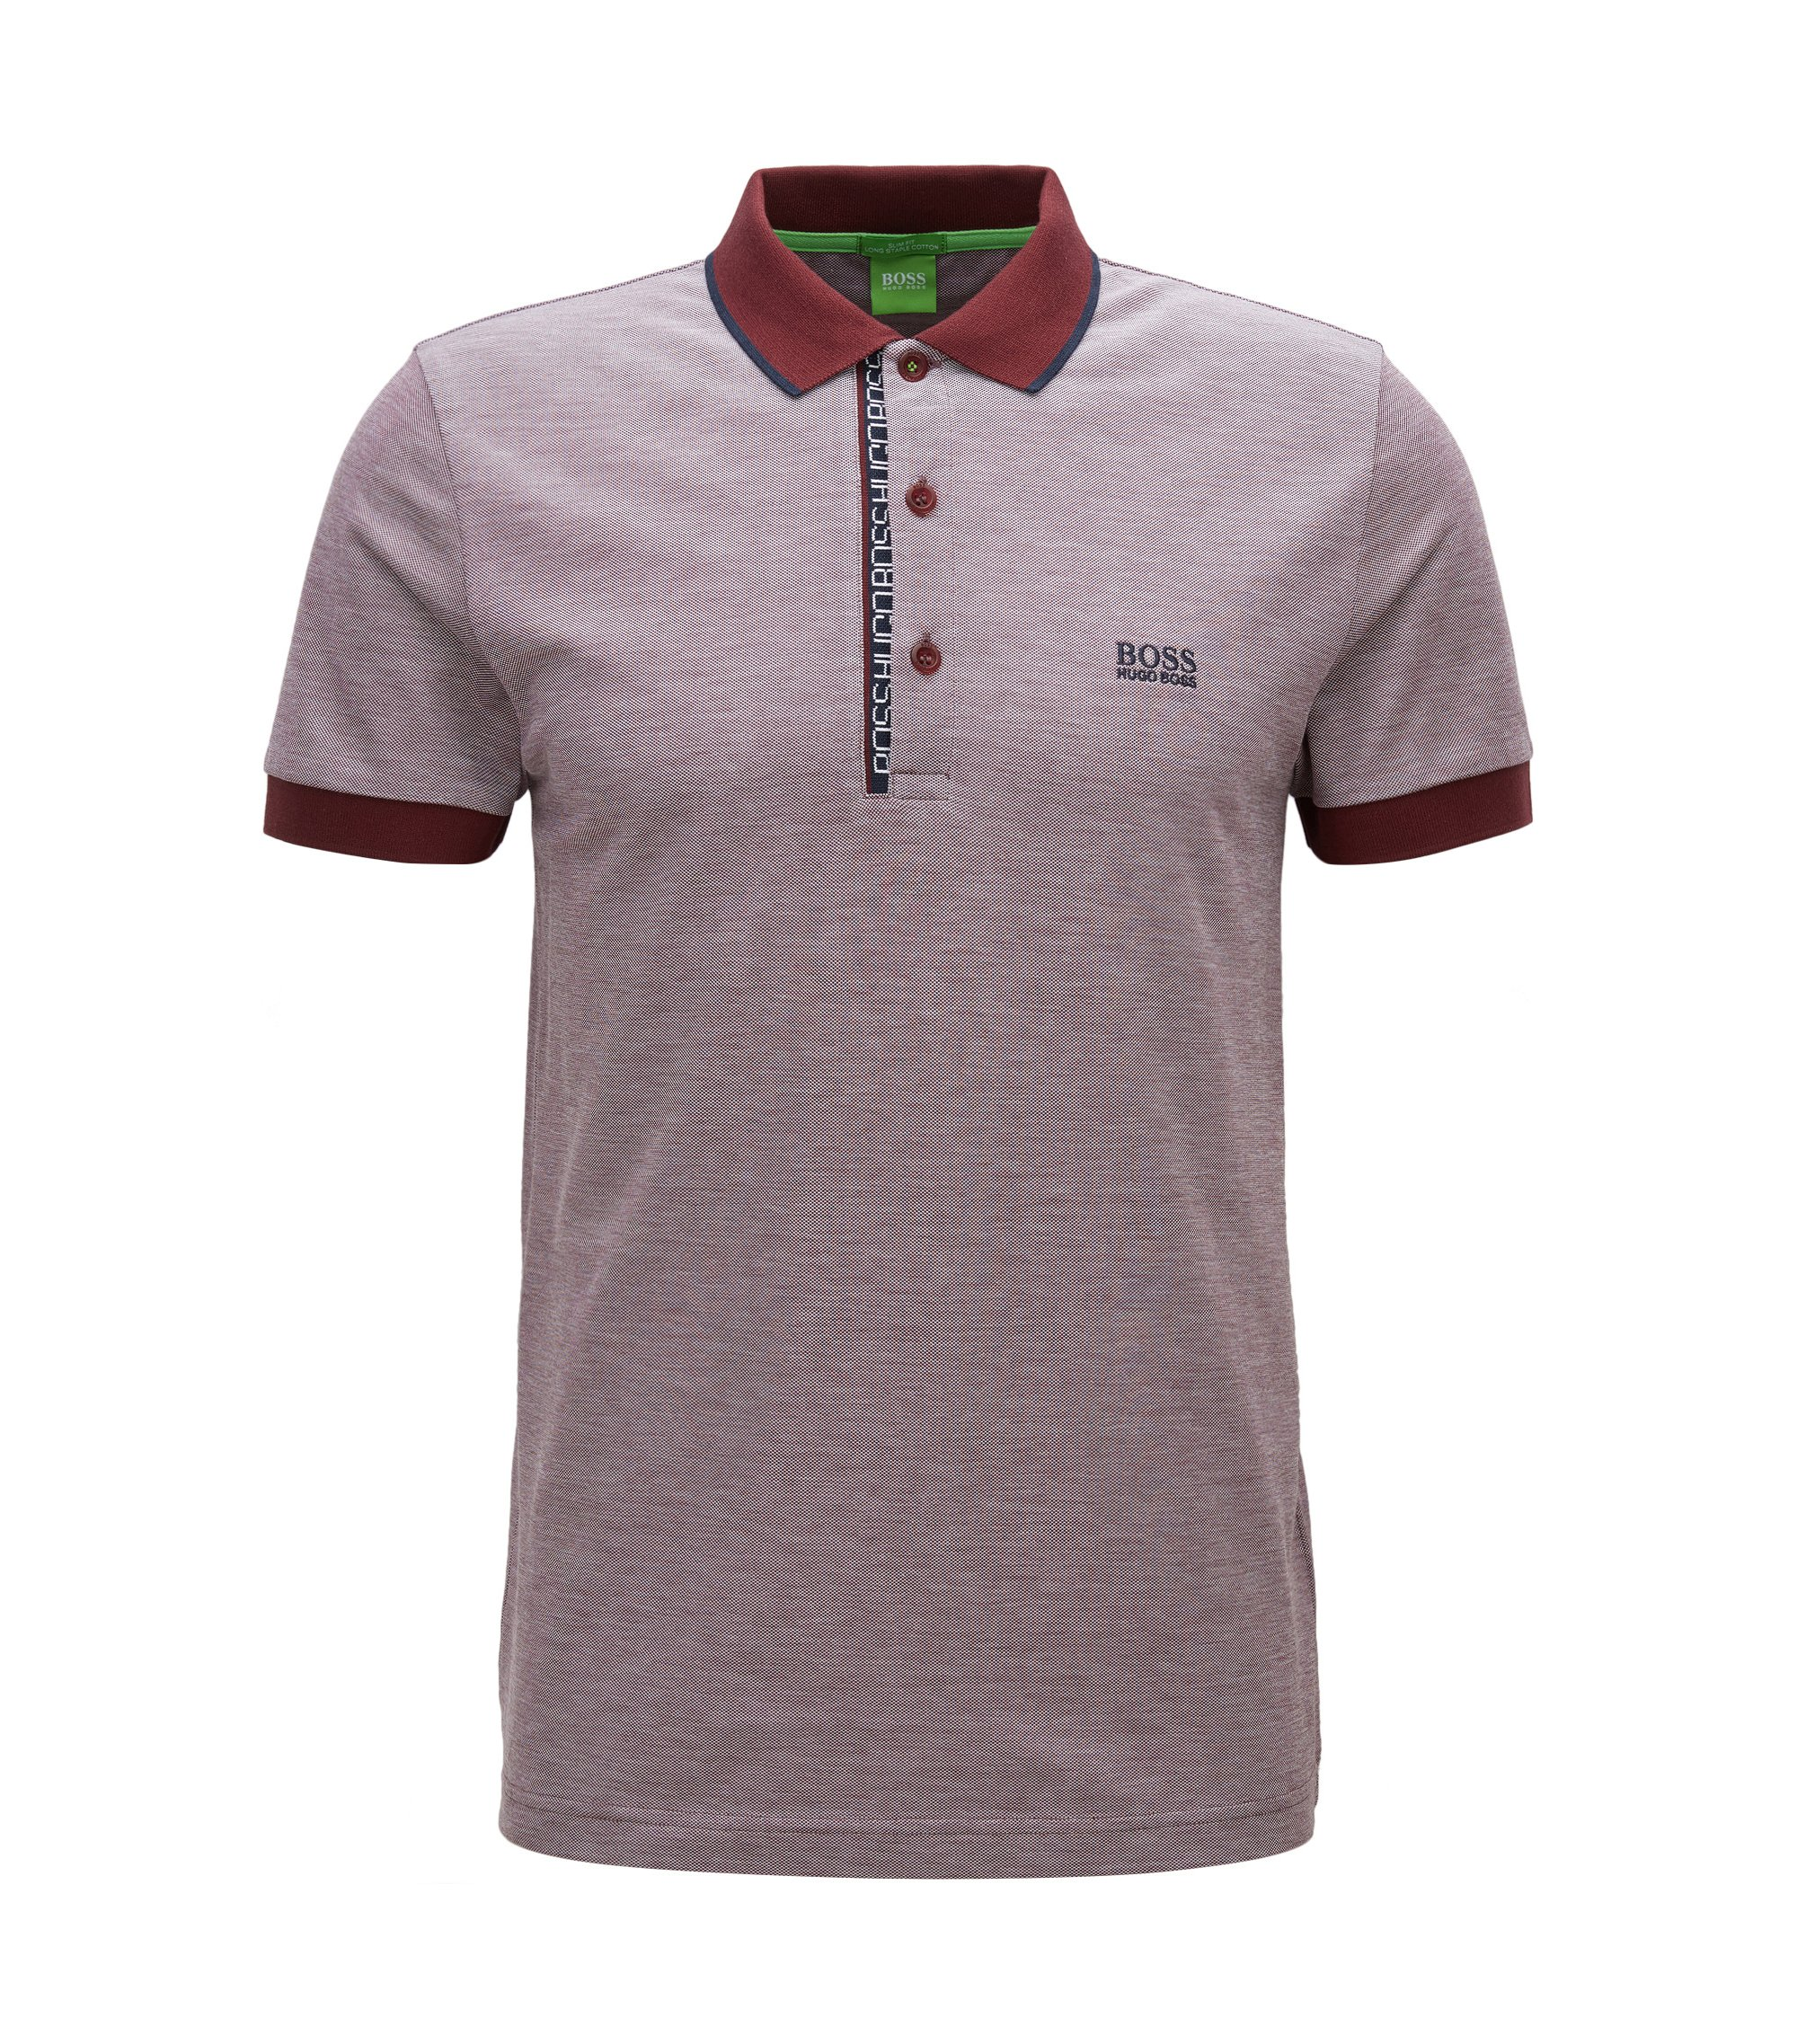 Oxfotd Cotton Polo Shirt, Slim Fit   Paule, Red